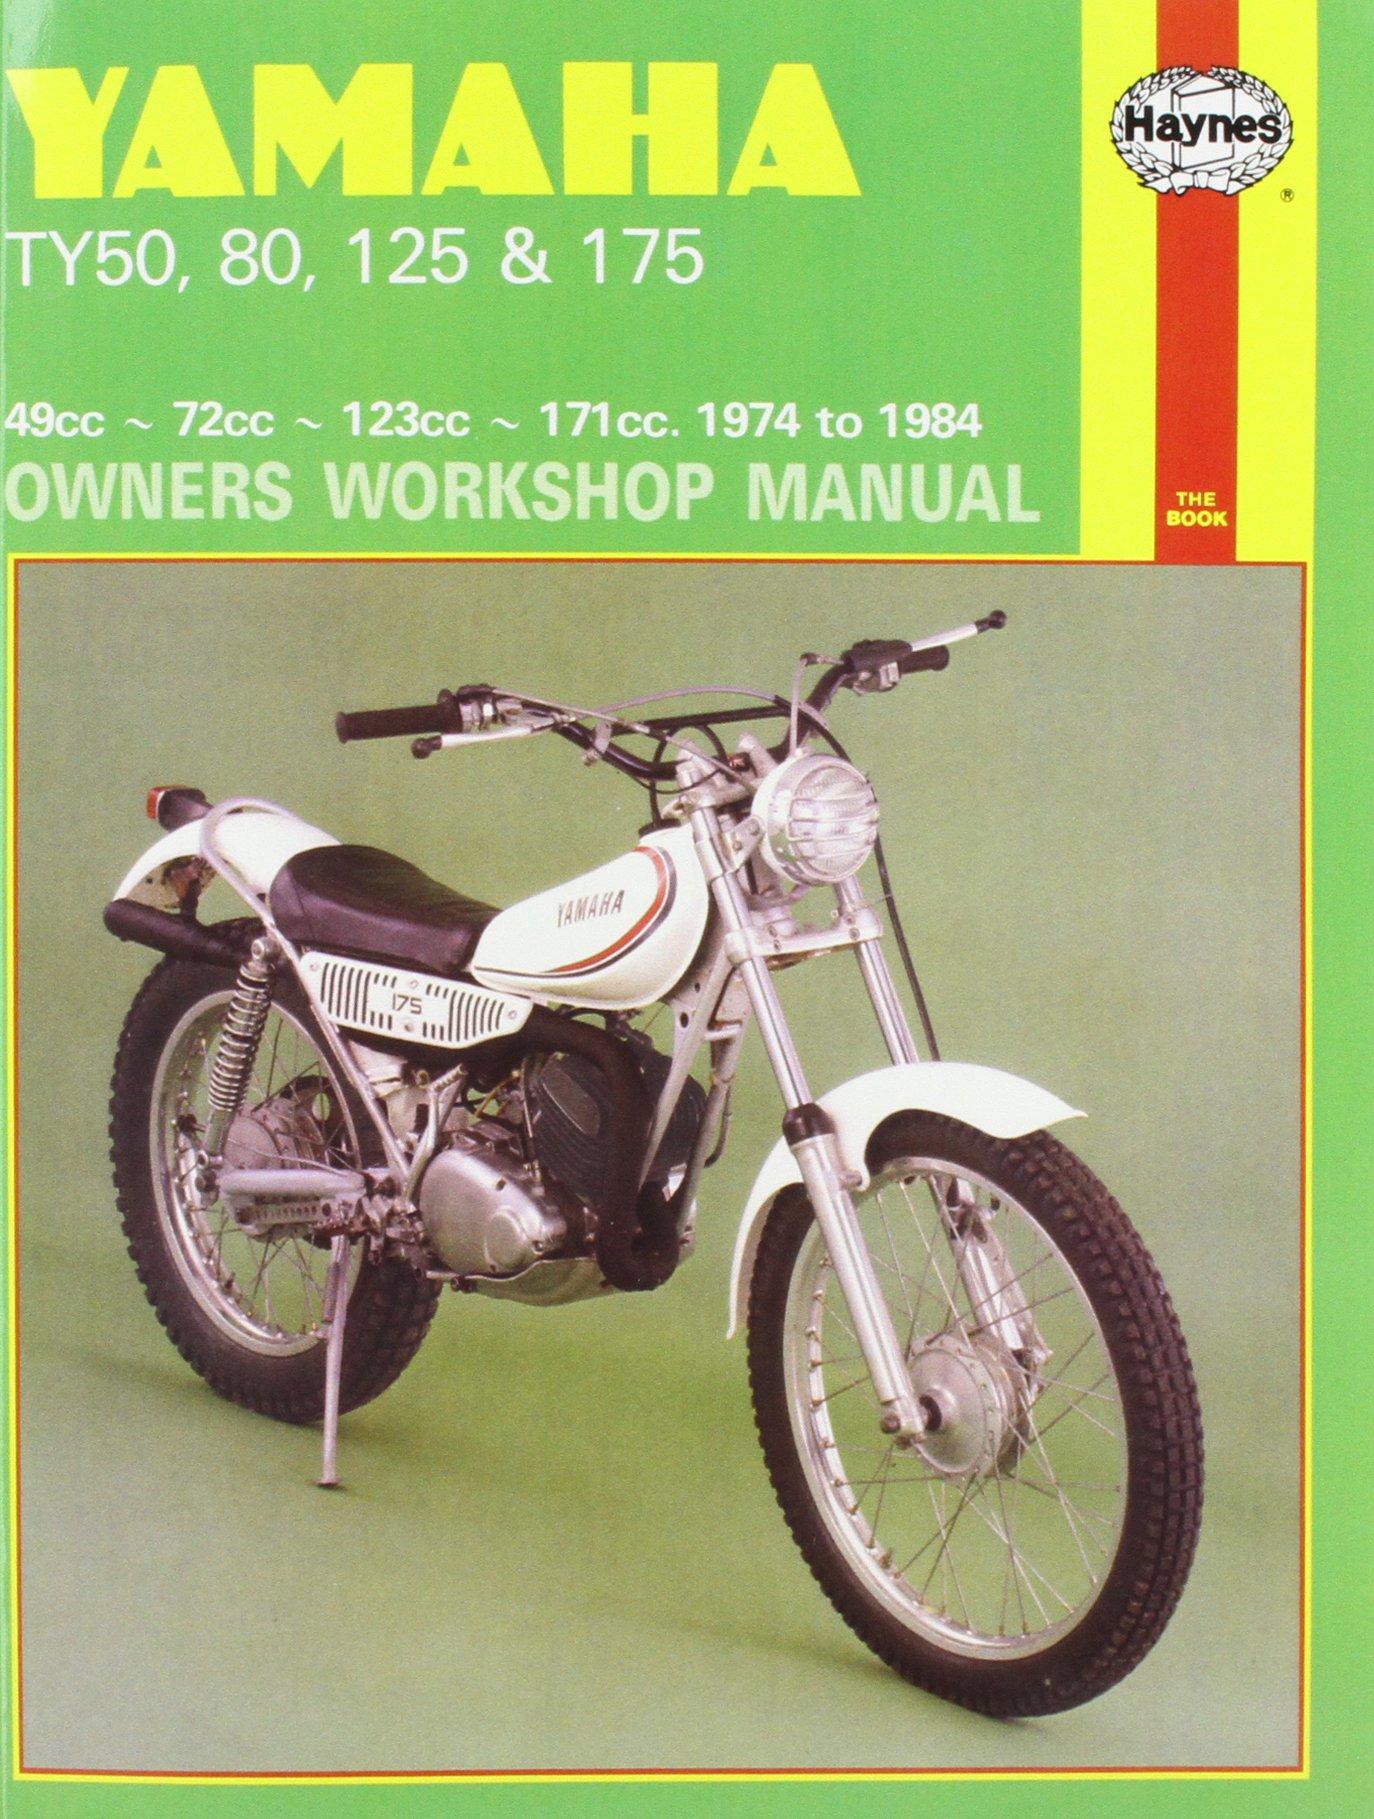 Free suzuki motorcycle repair manual.